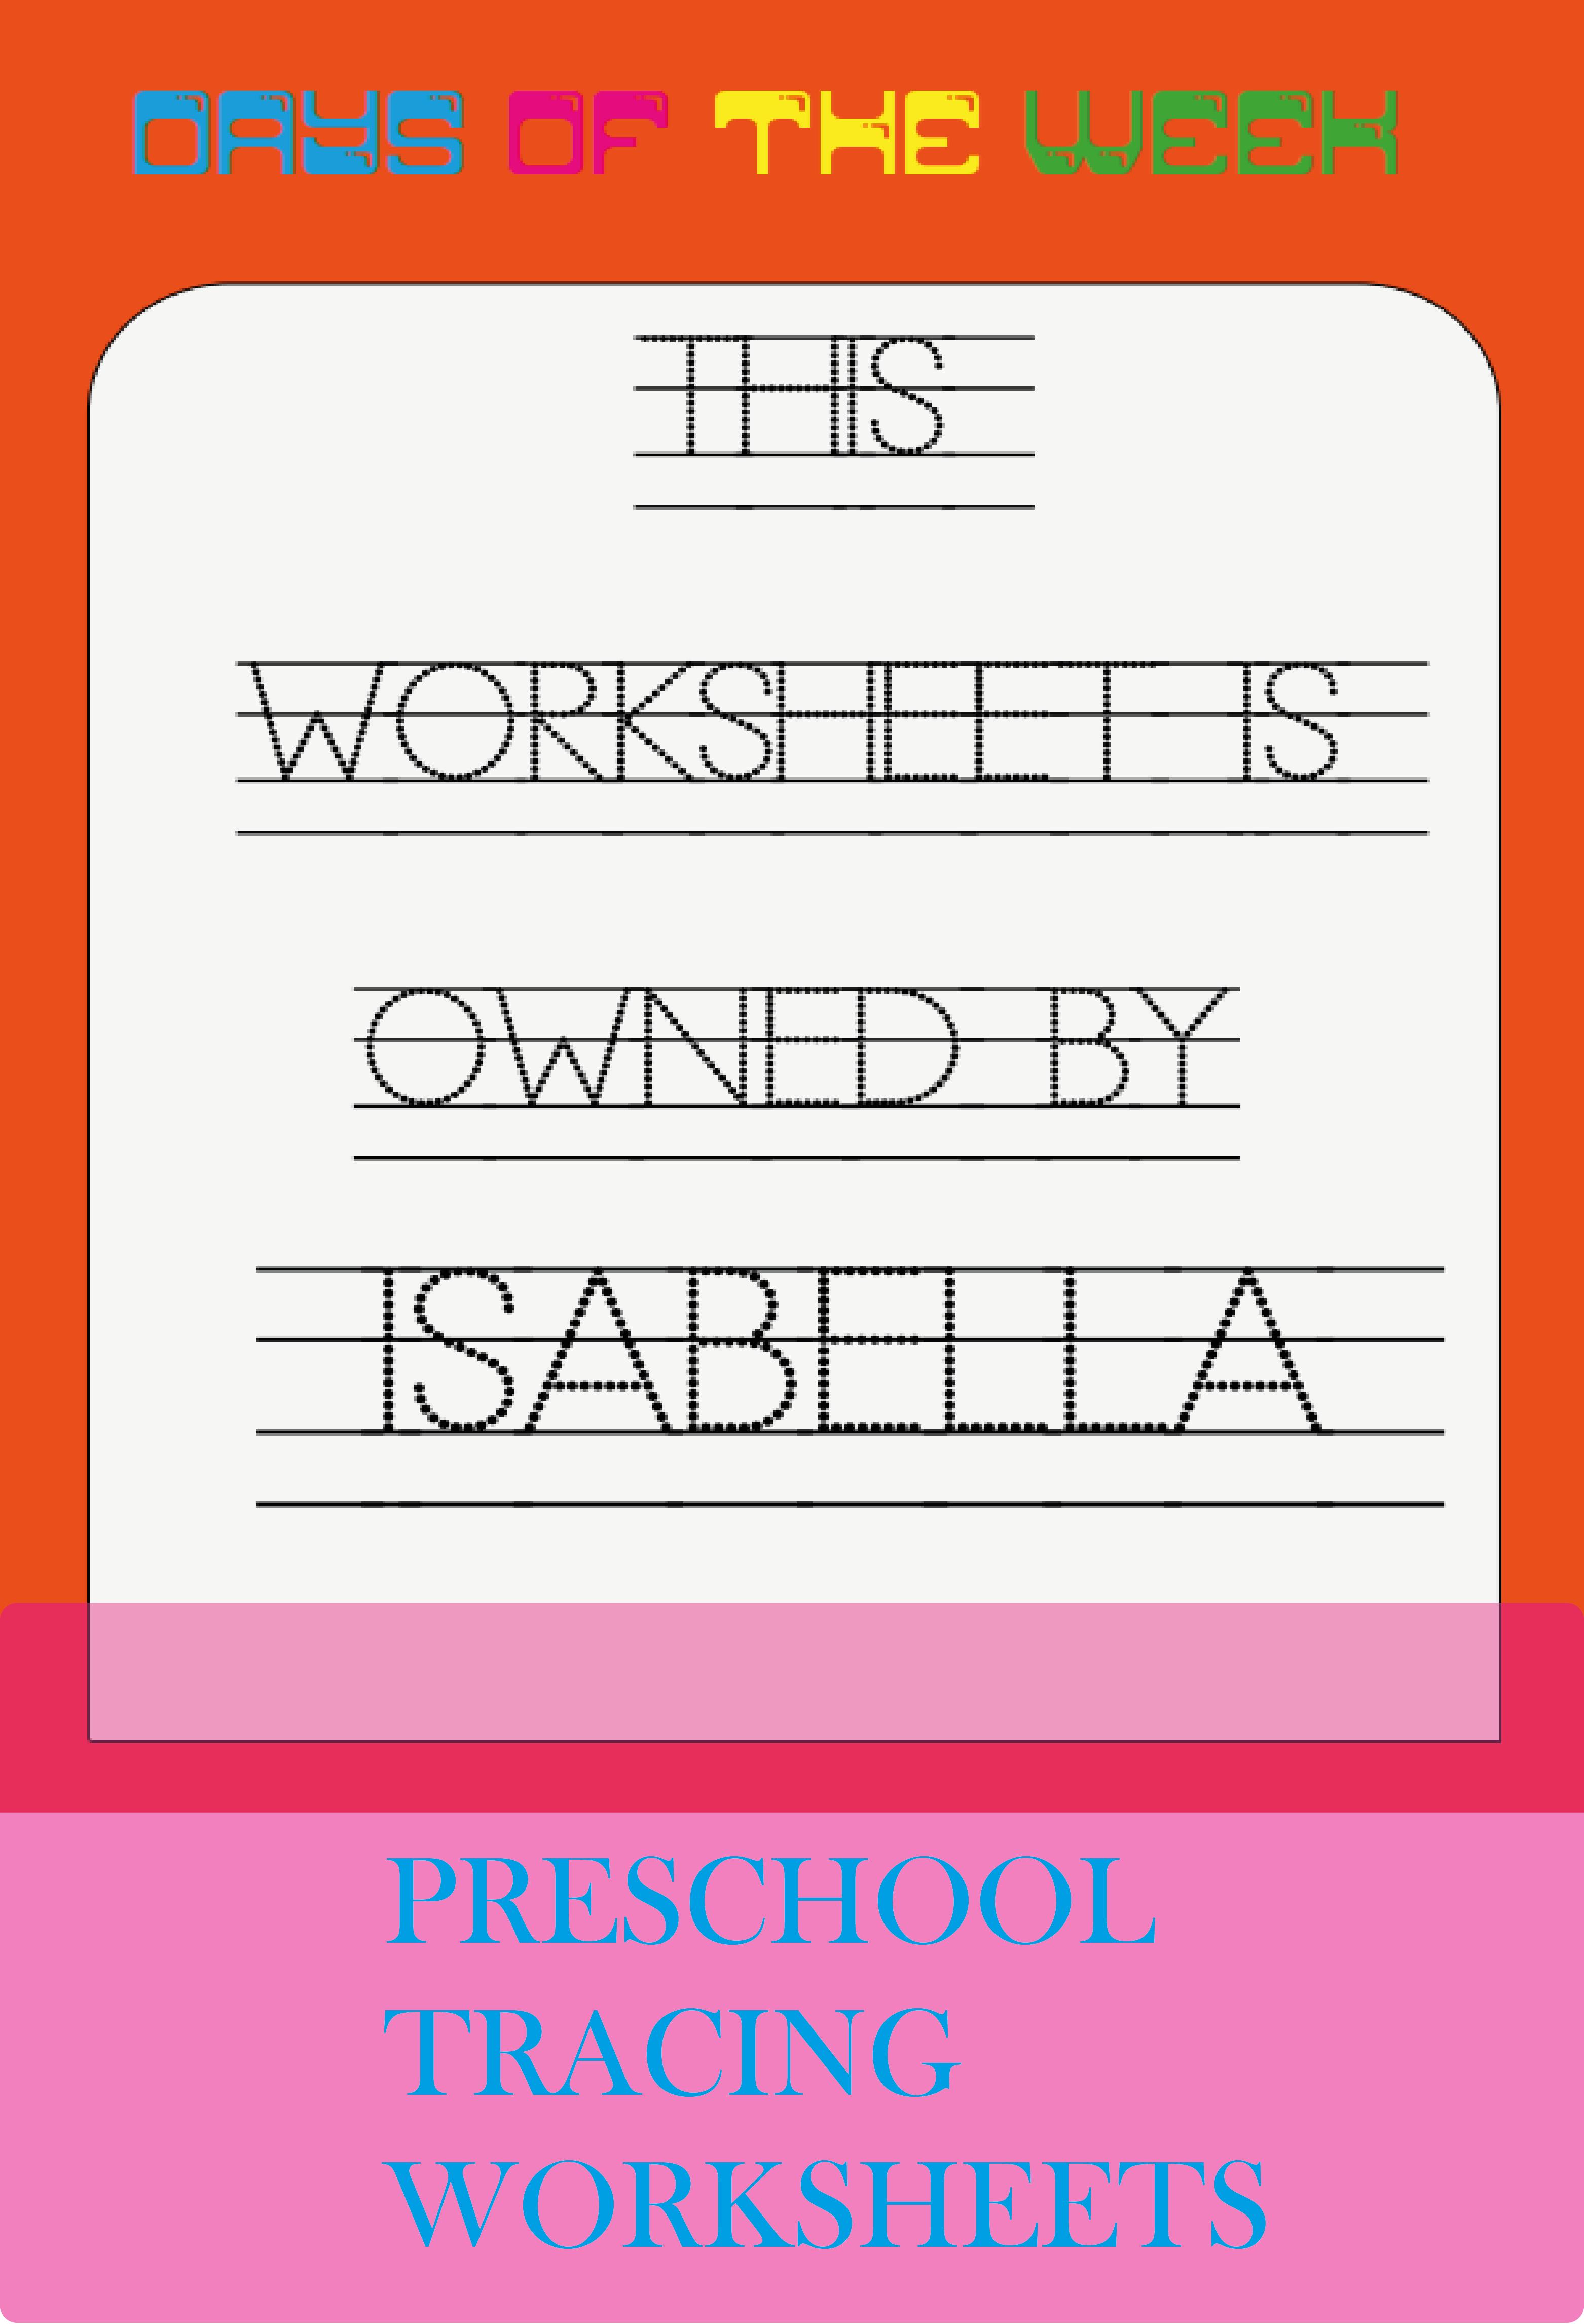 Trace Of The Week Worksheet Customizable Worksheets And Etsy Tracing Worksheets Tracing Worksheets Preschool Worksheets [ 4584 x 3125 Pixel ]